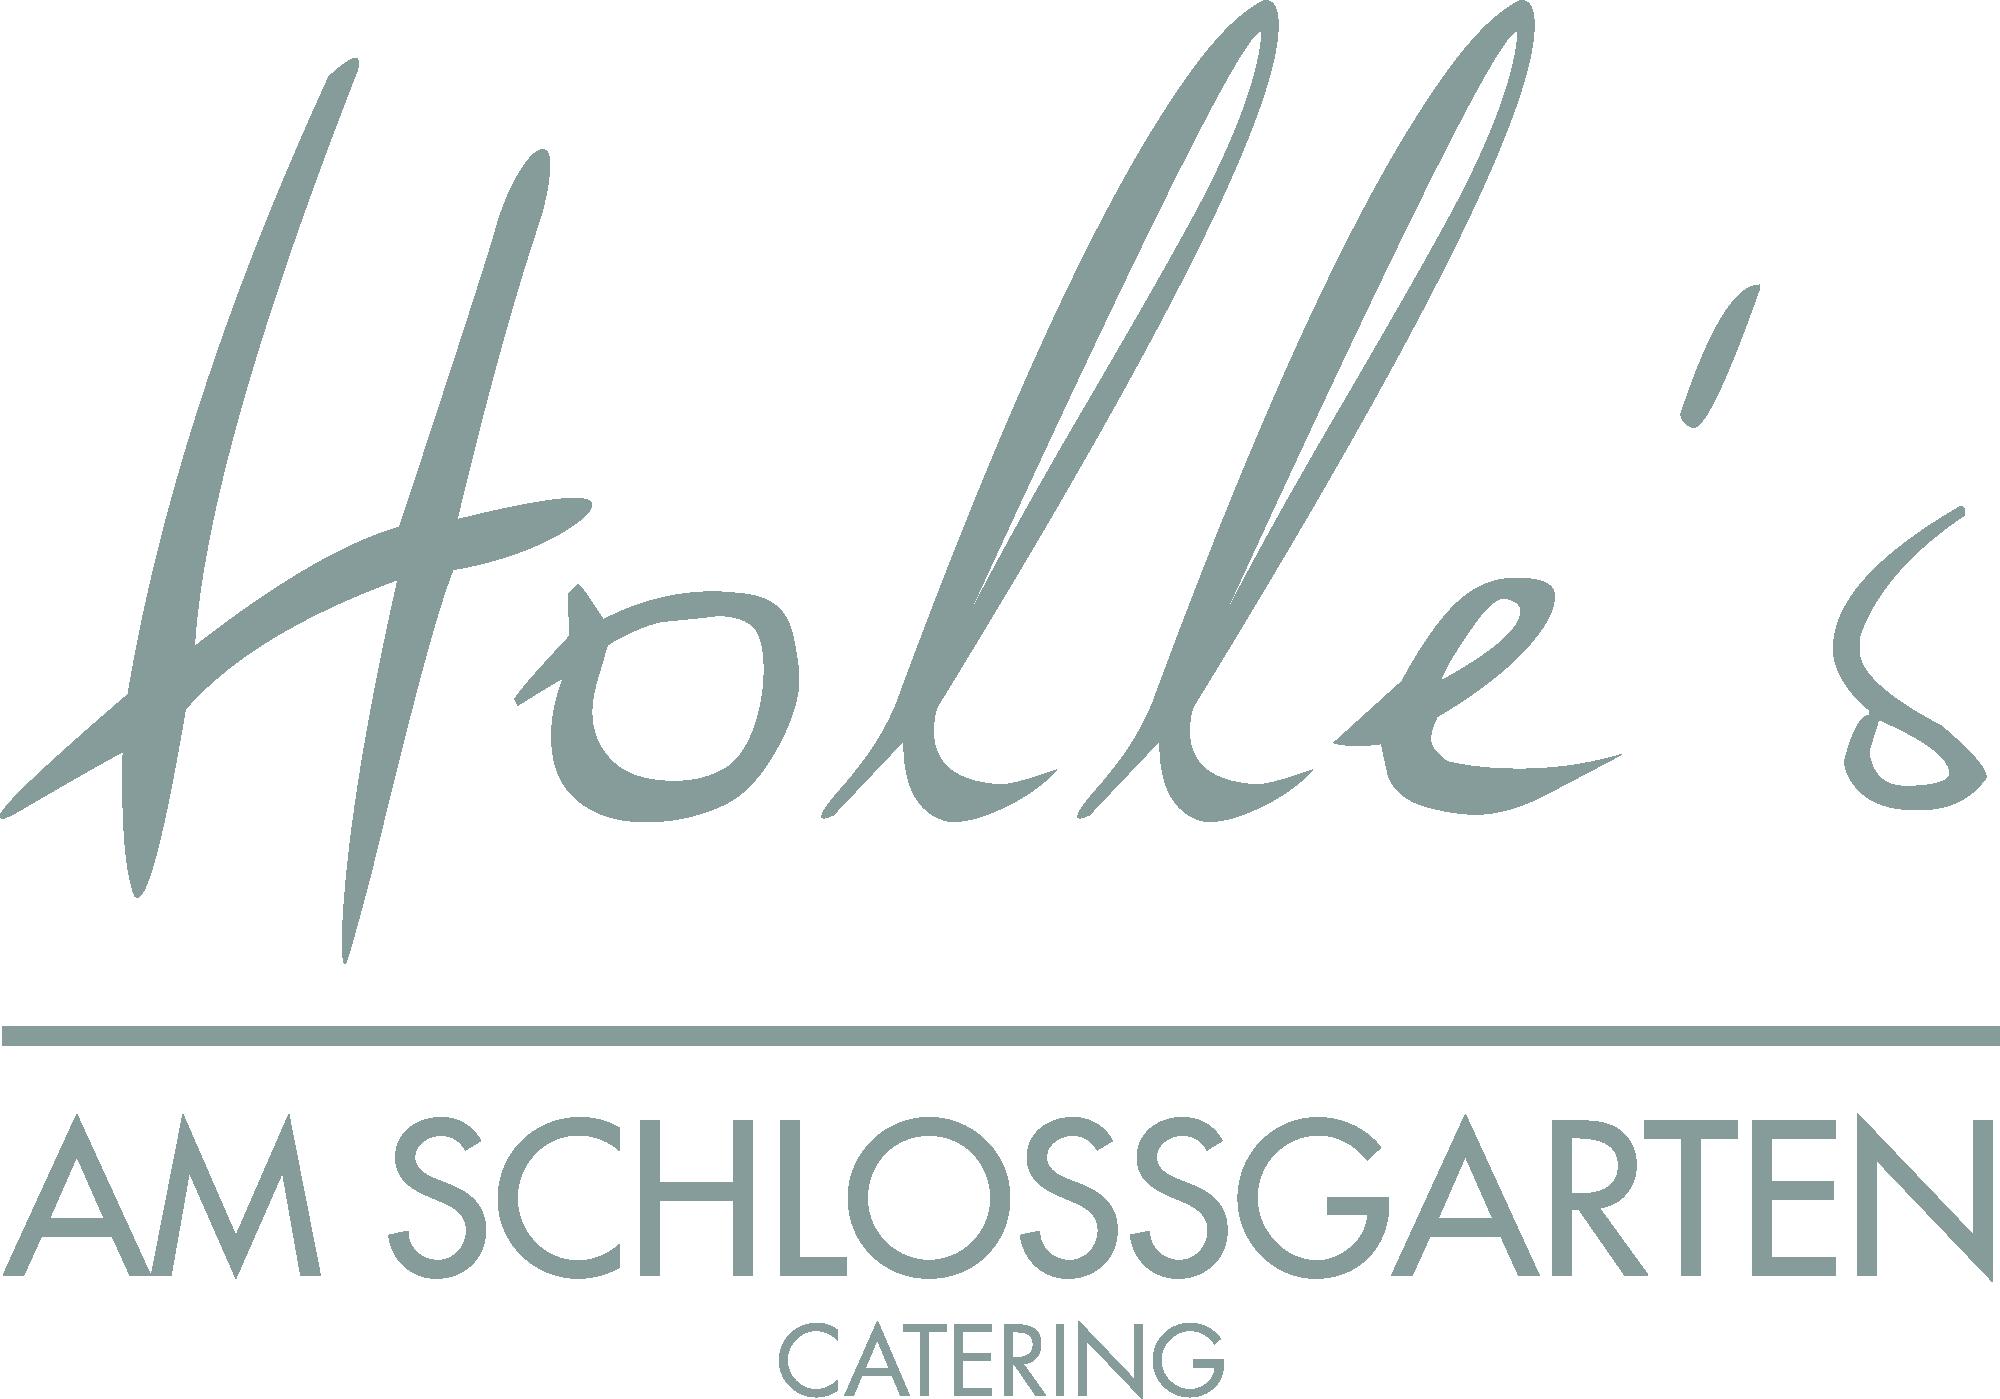 Logo Holles im Schlossgarten Catering